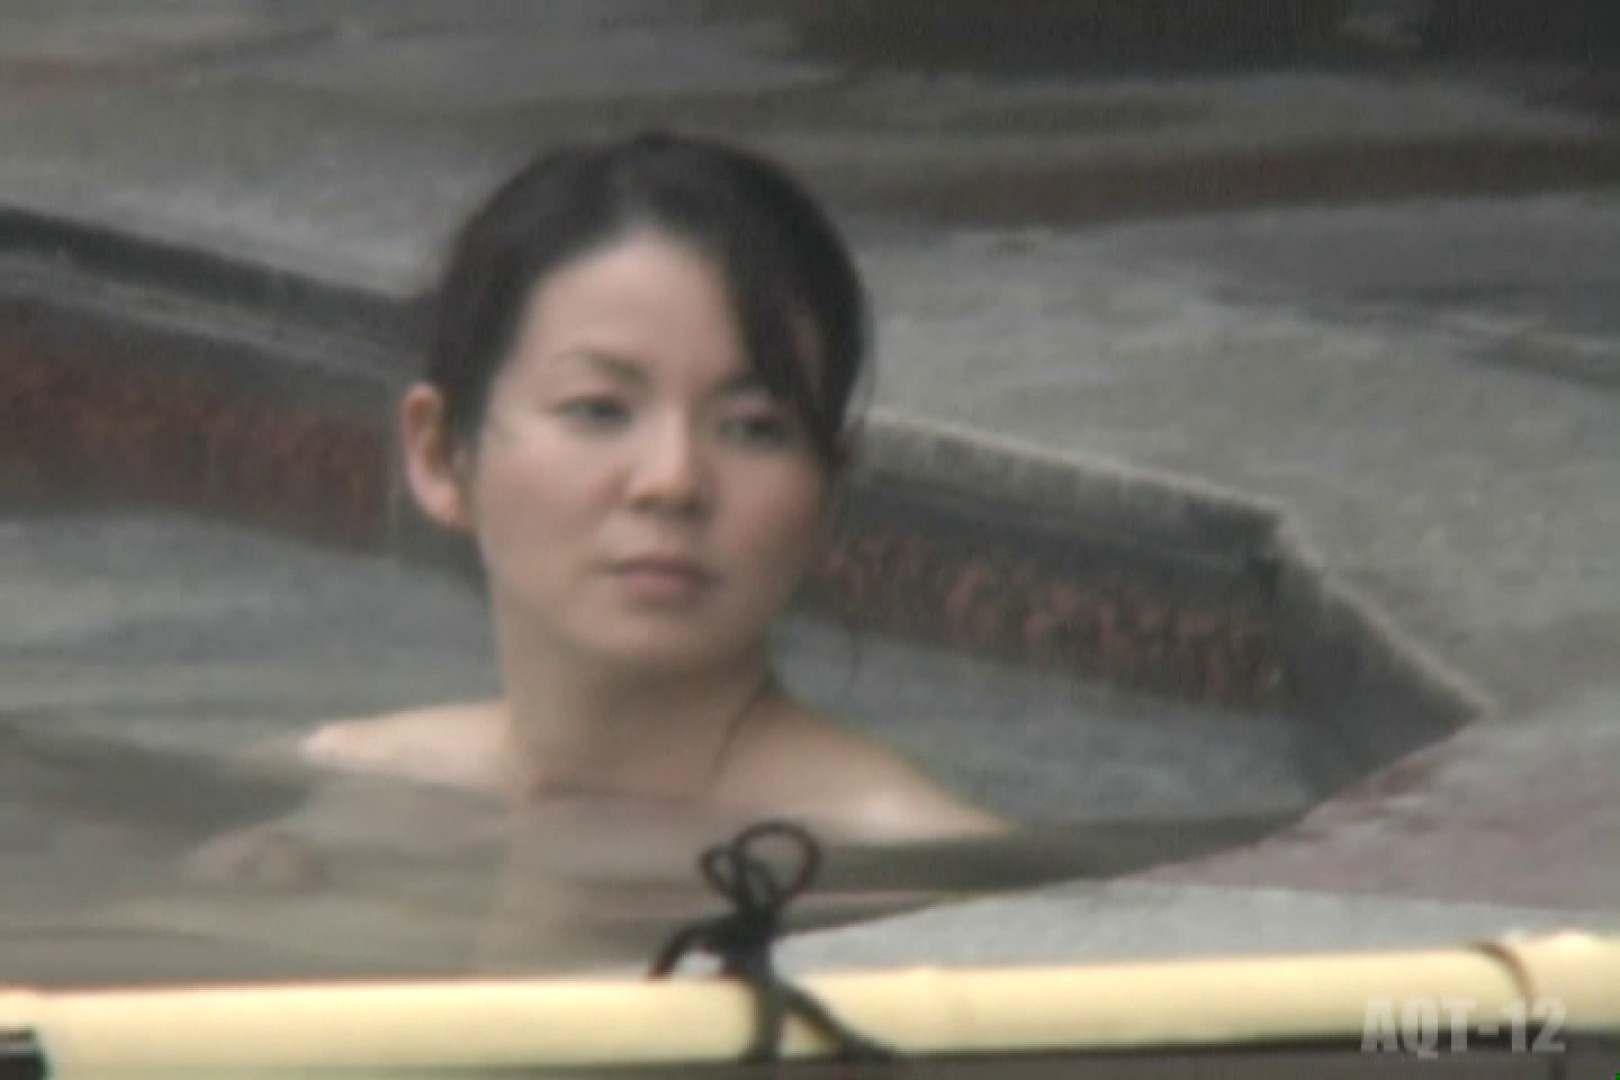 Aquaな露天風呂Vol.811 0  38連発 32